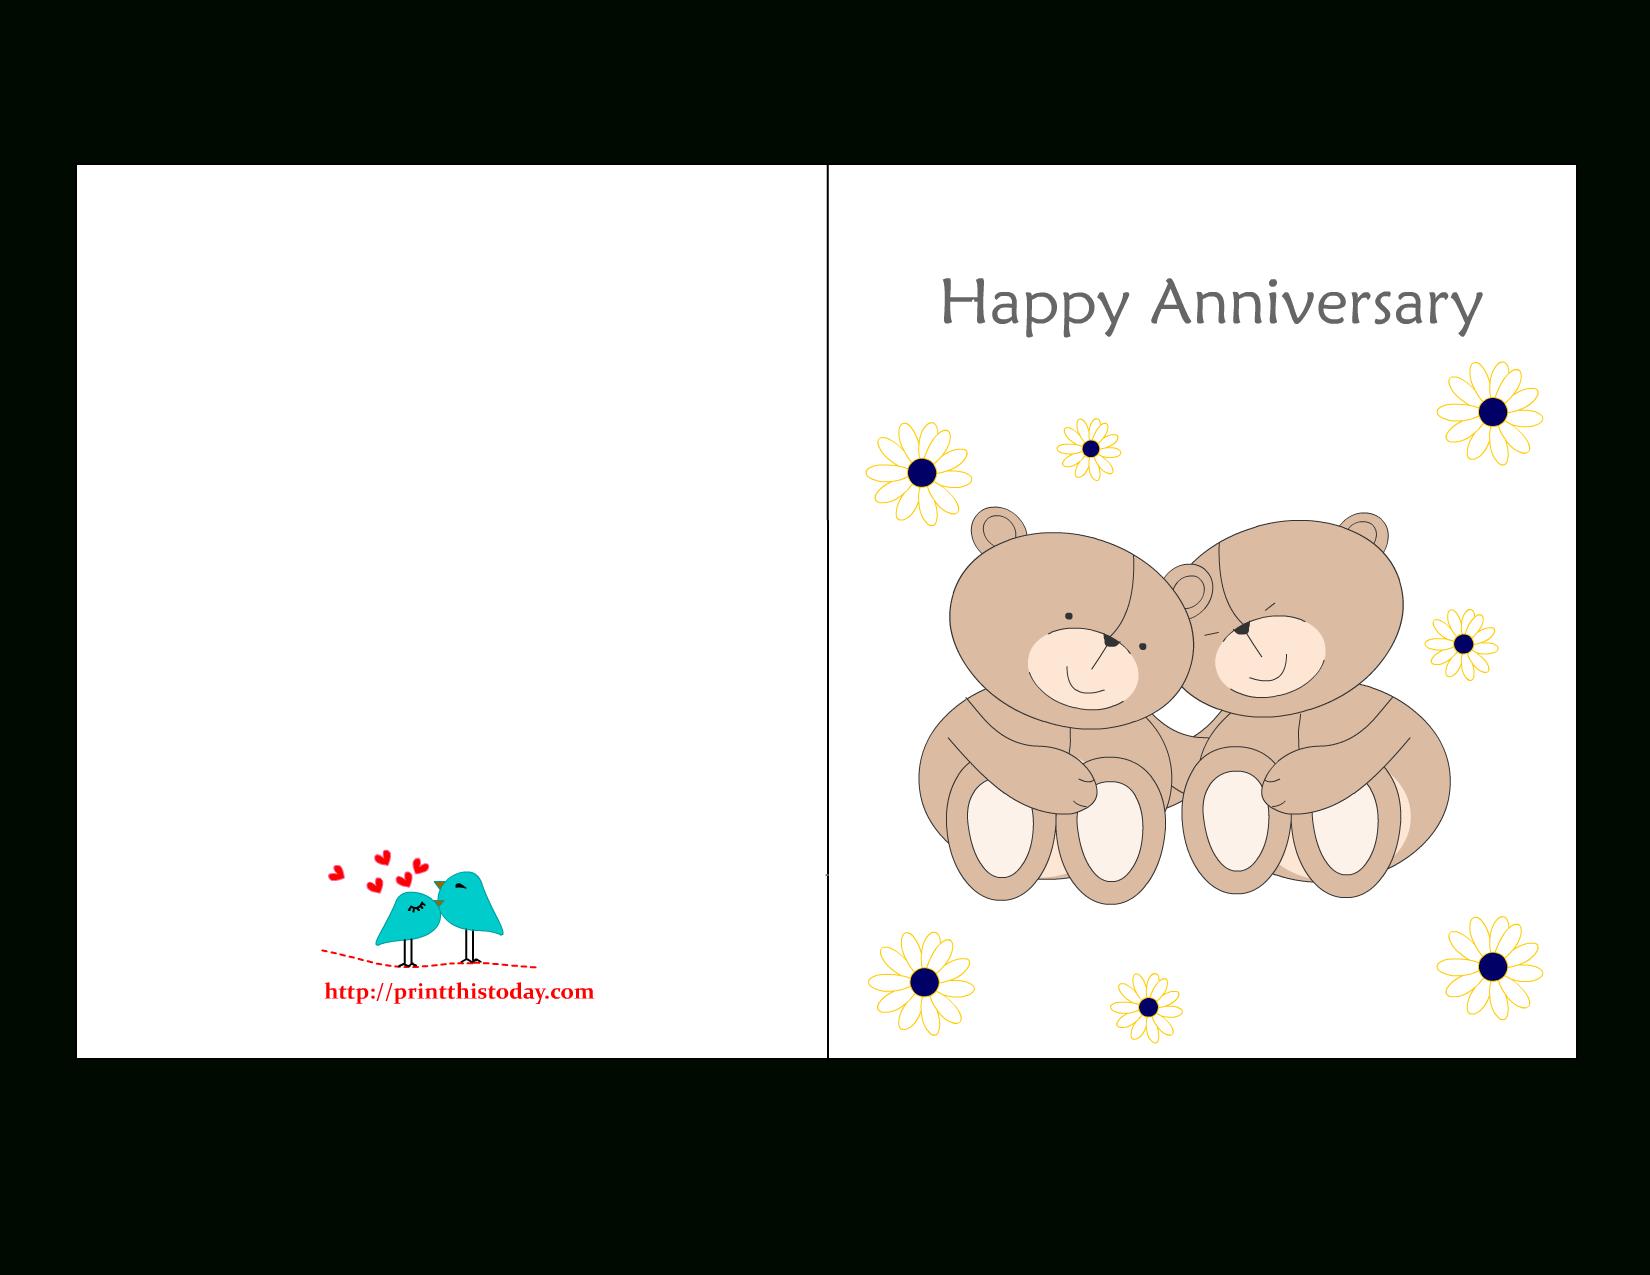 Free Printable Anniversary Cards - Free Anniversary Printables